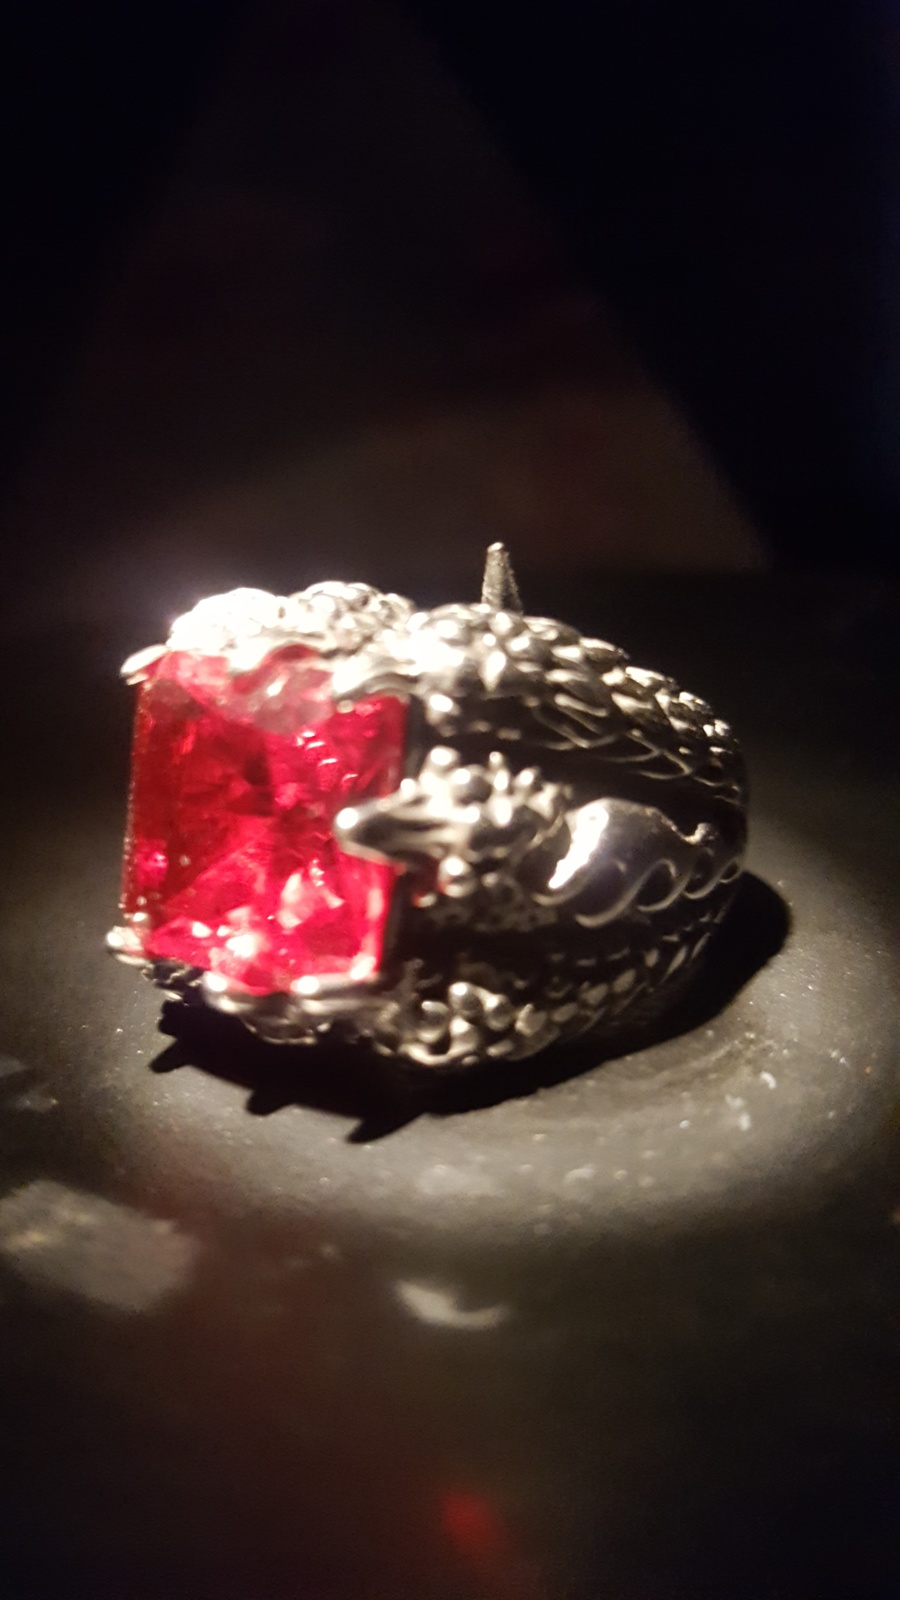 Haunted DJINN ring energy of the dragon djinn spirit to grant wishes voodoo  - $299.97